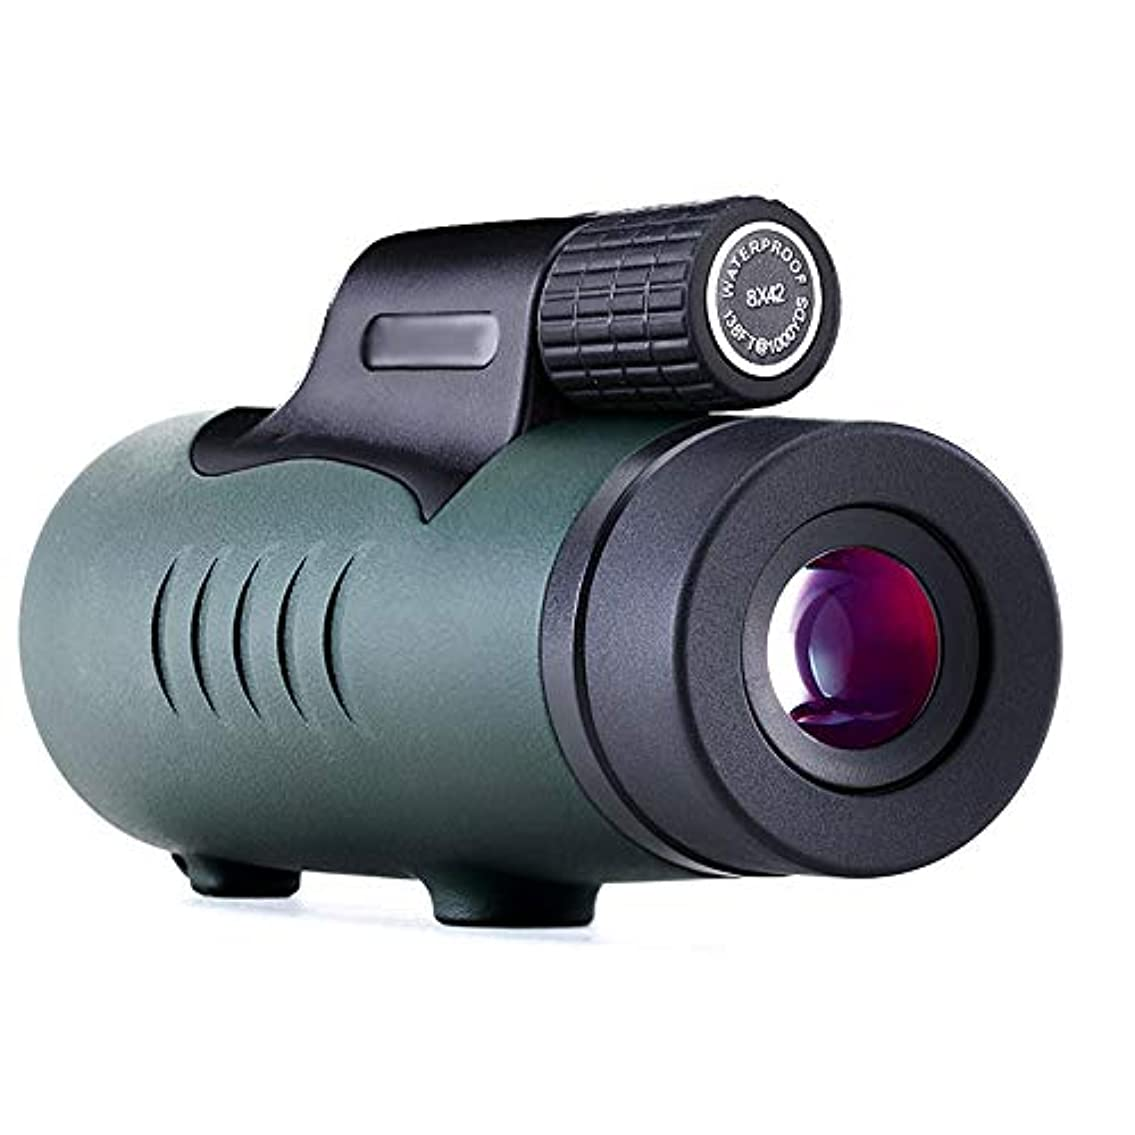 新年電報代数単眼、10×50高倍率、高精細、大口径、屋外キャンプの携帯電話の写真の望遠鏡、鳥の鏡